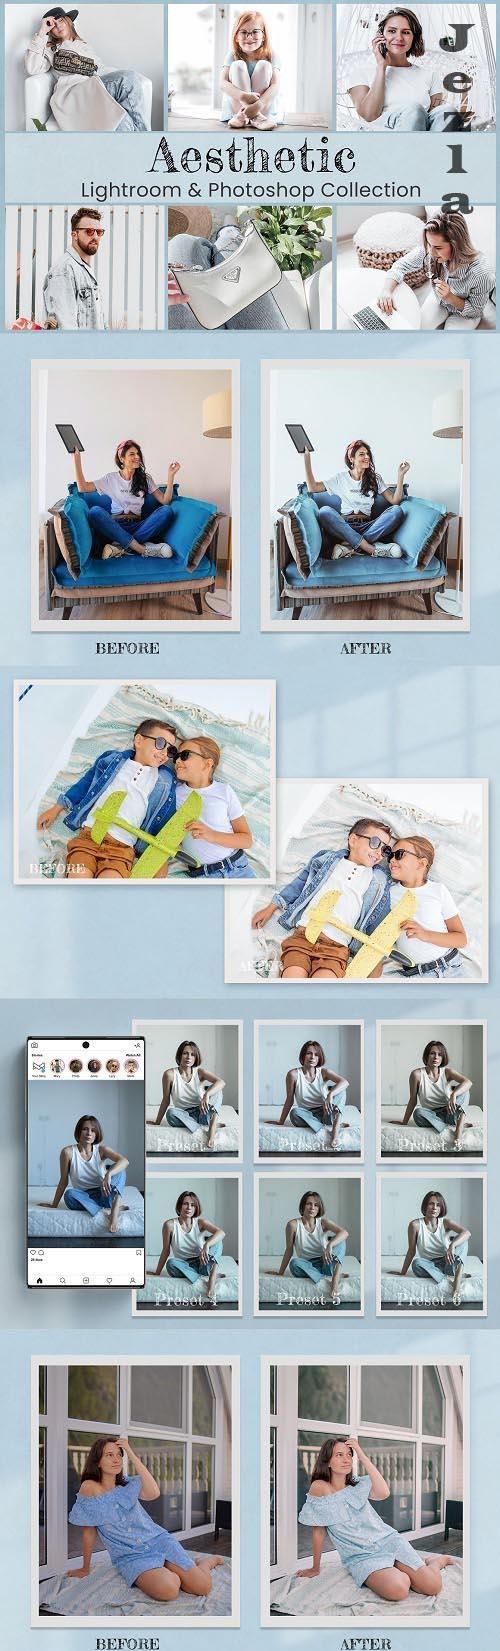 Aesthetic Lightroom Photoshop LUTs - 6465992